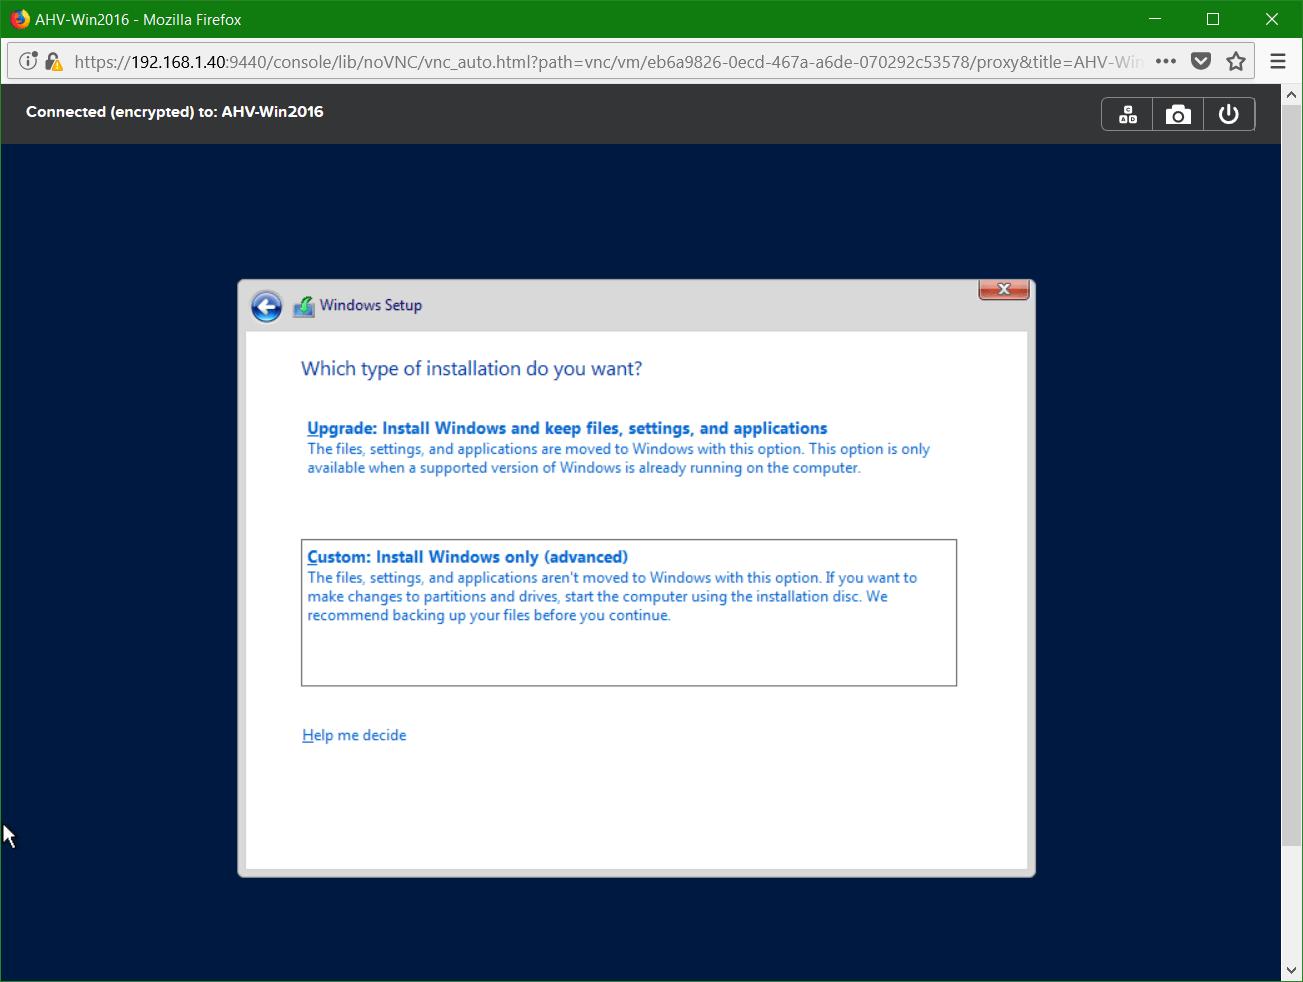 domalab.com Nutanix Windows AHV guest custom install